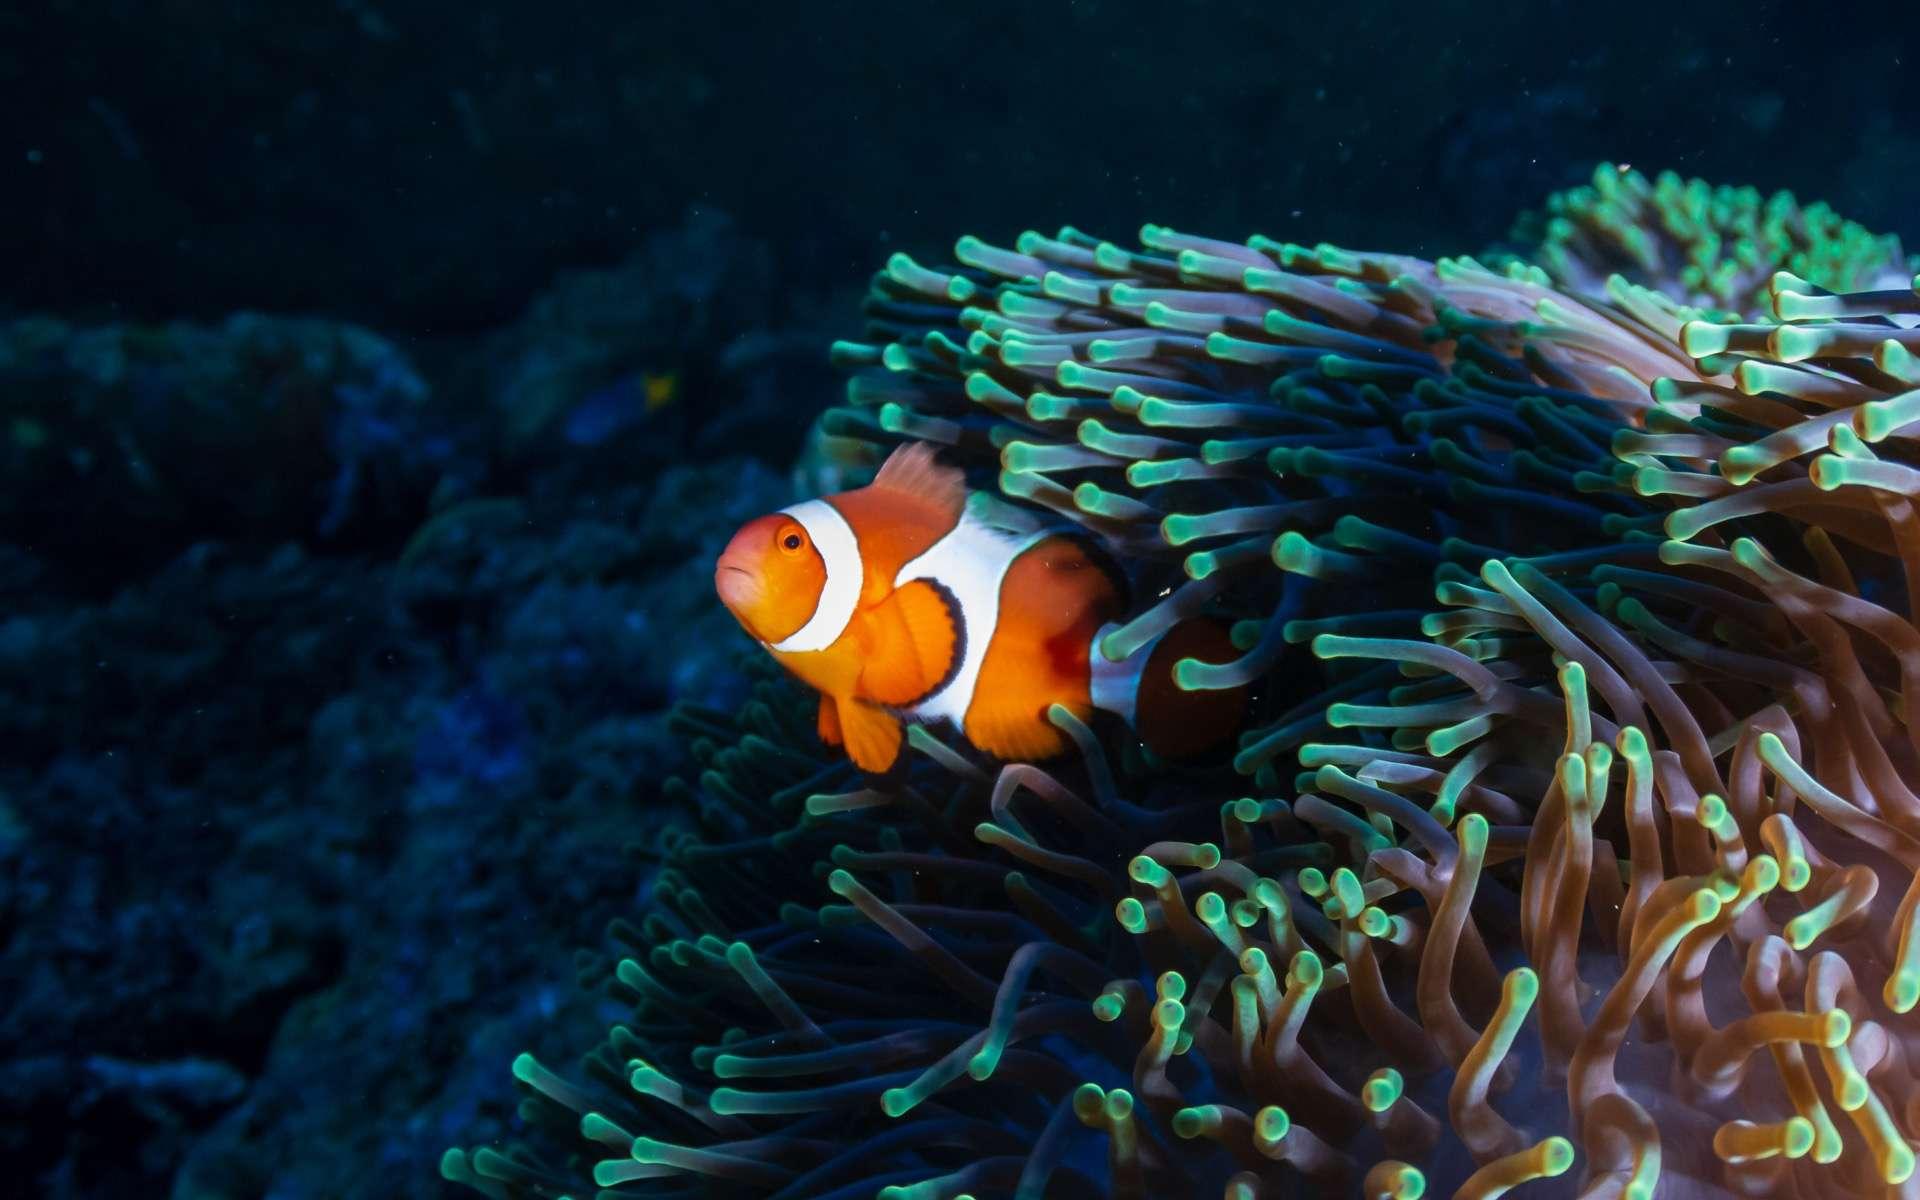 Le poisson-clown reste toute sa vie dans la même anémone. © Whitcomberd, Adobe Stock